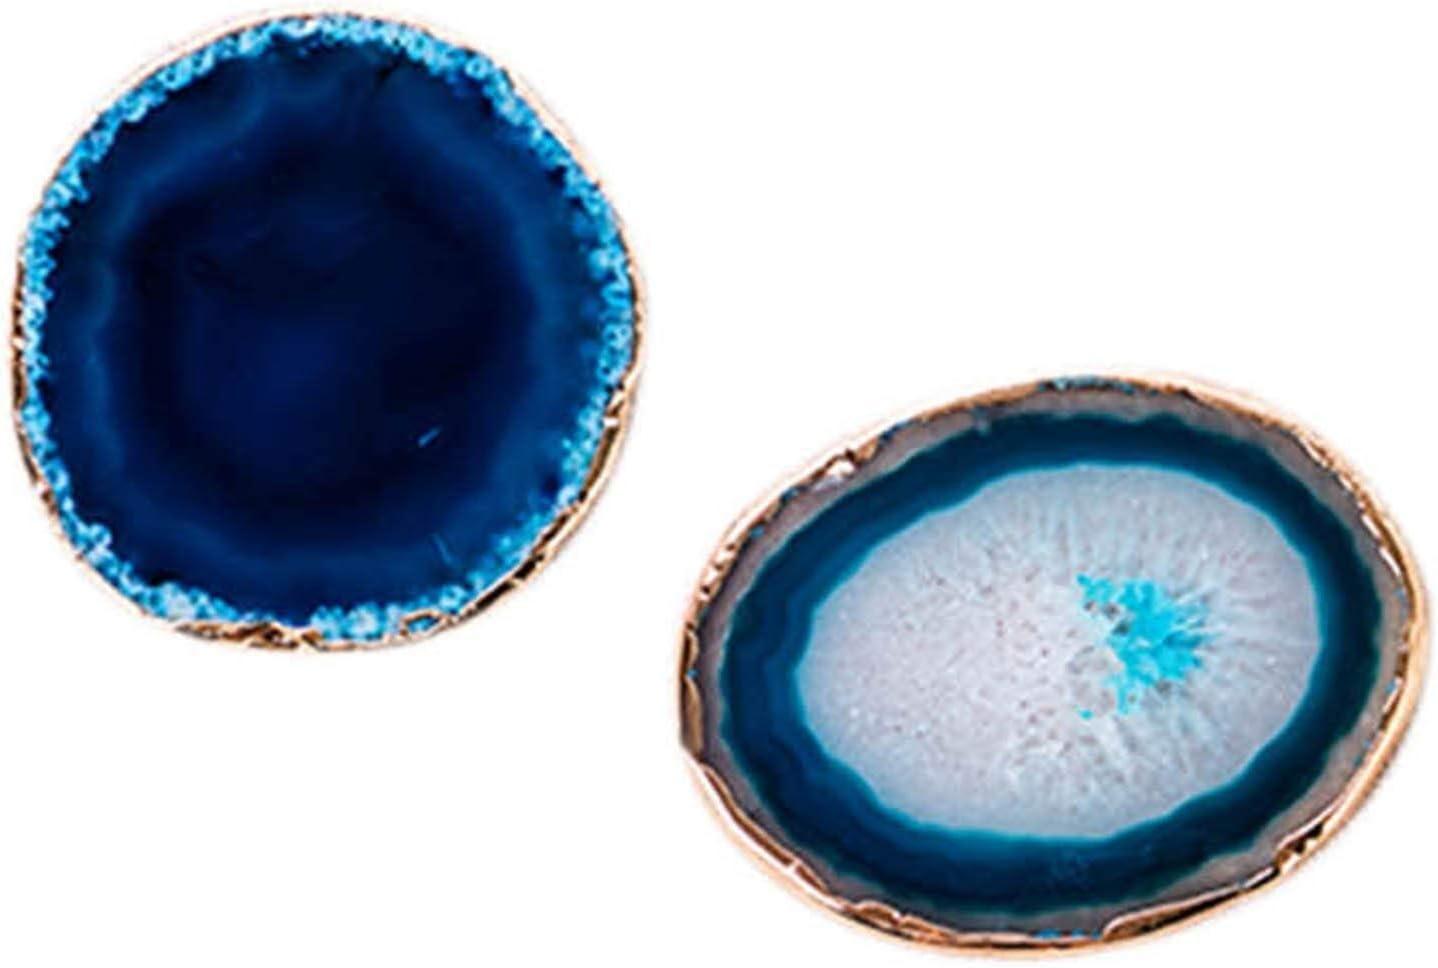 Yadianna 2Pcs Agate Slice Blue Teacup Tray Coaster Latest item Online limited product Decorat